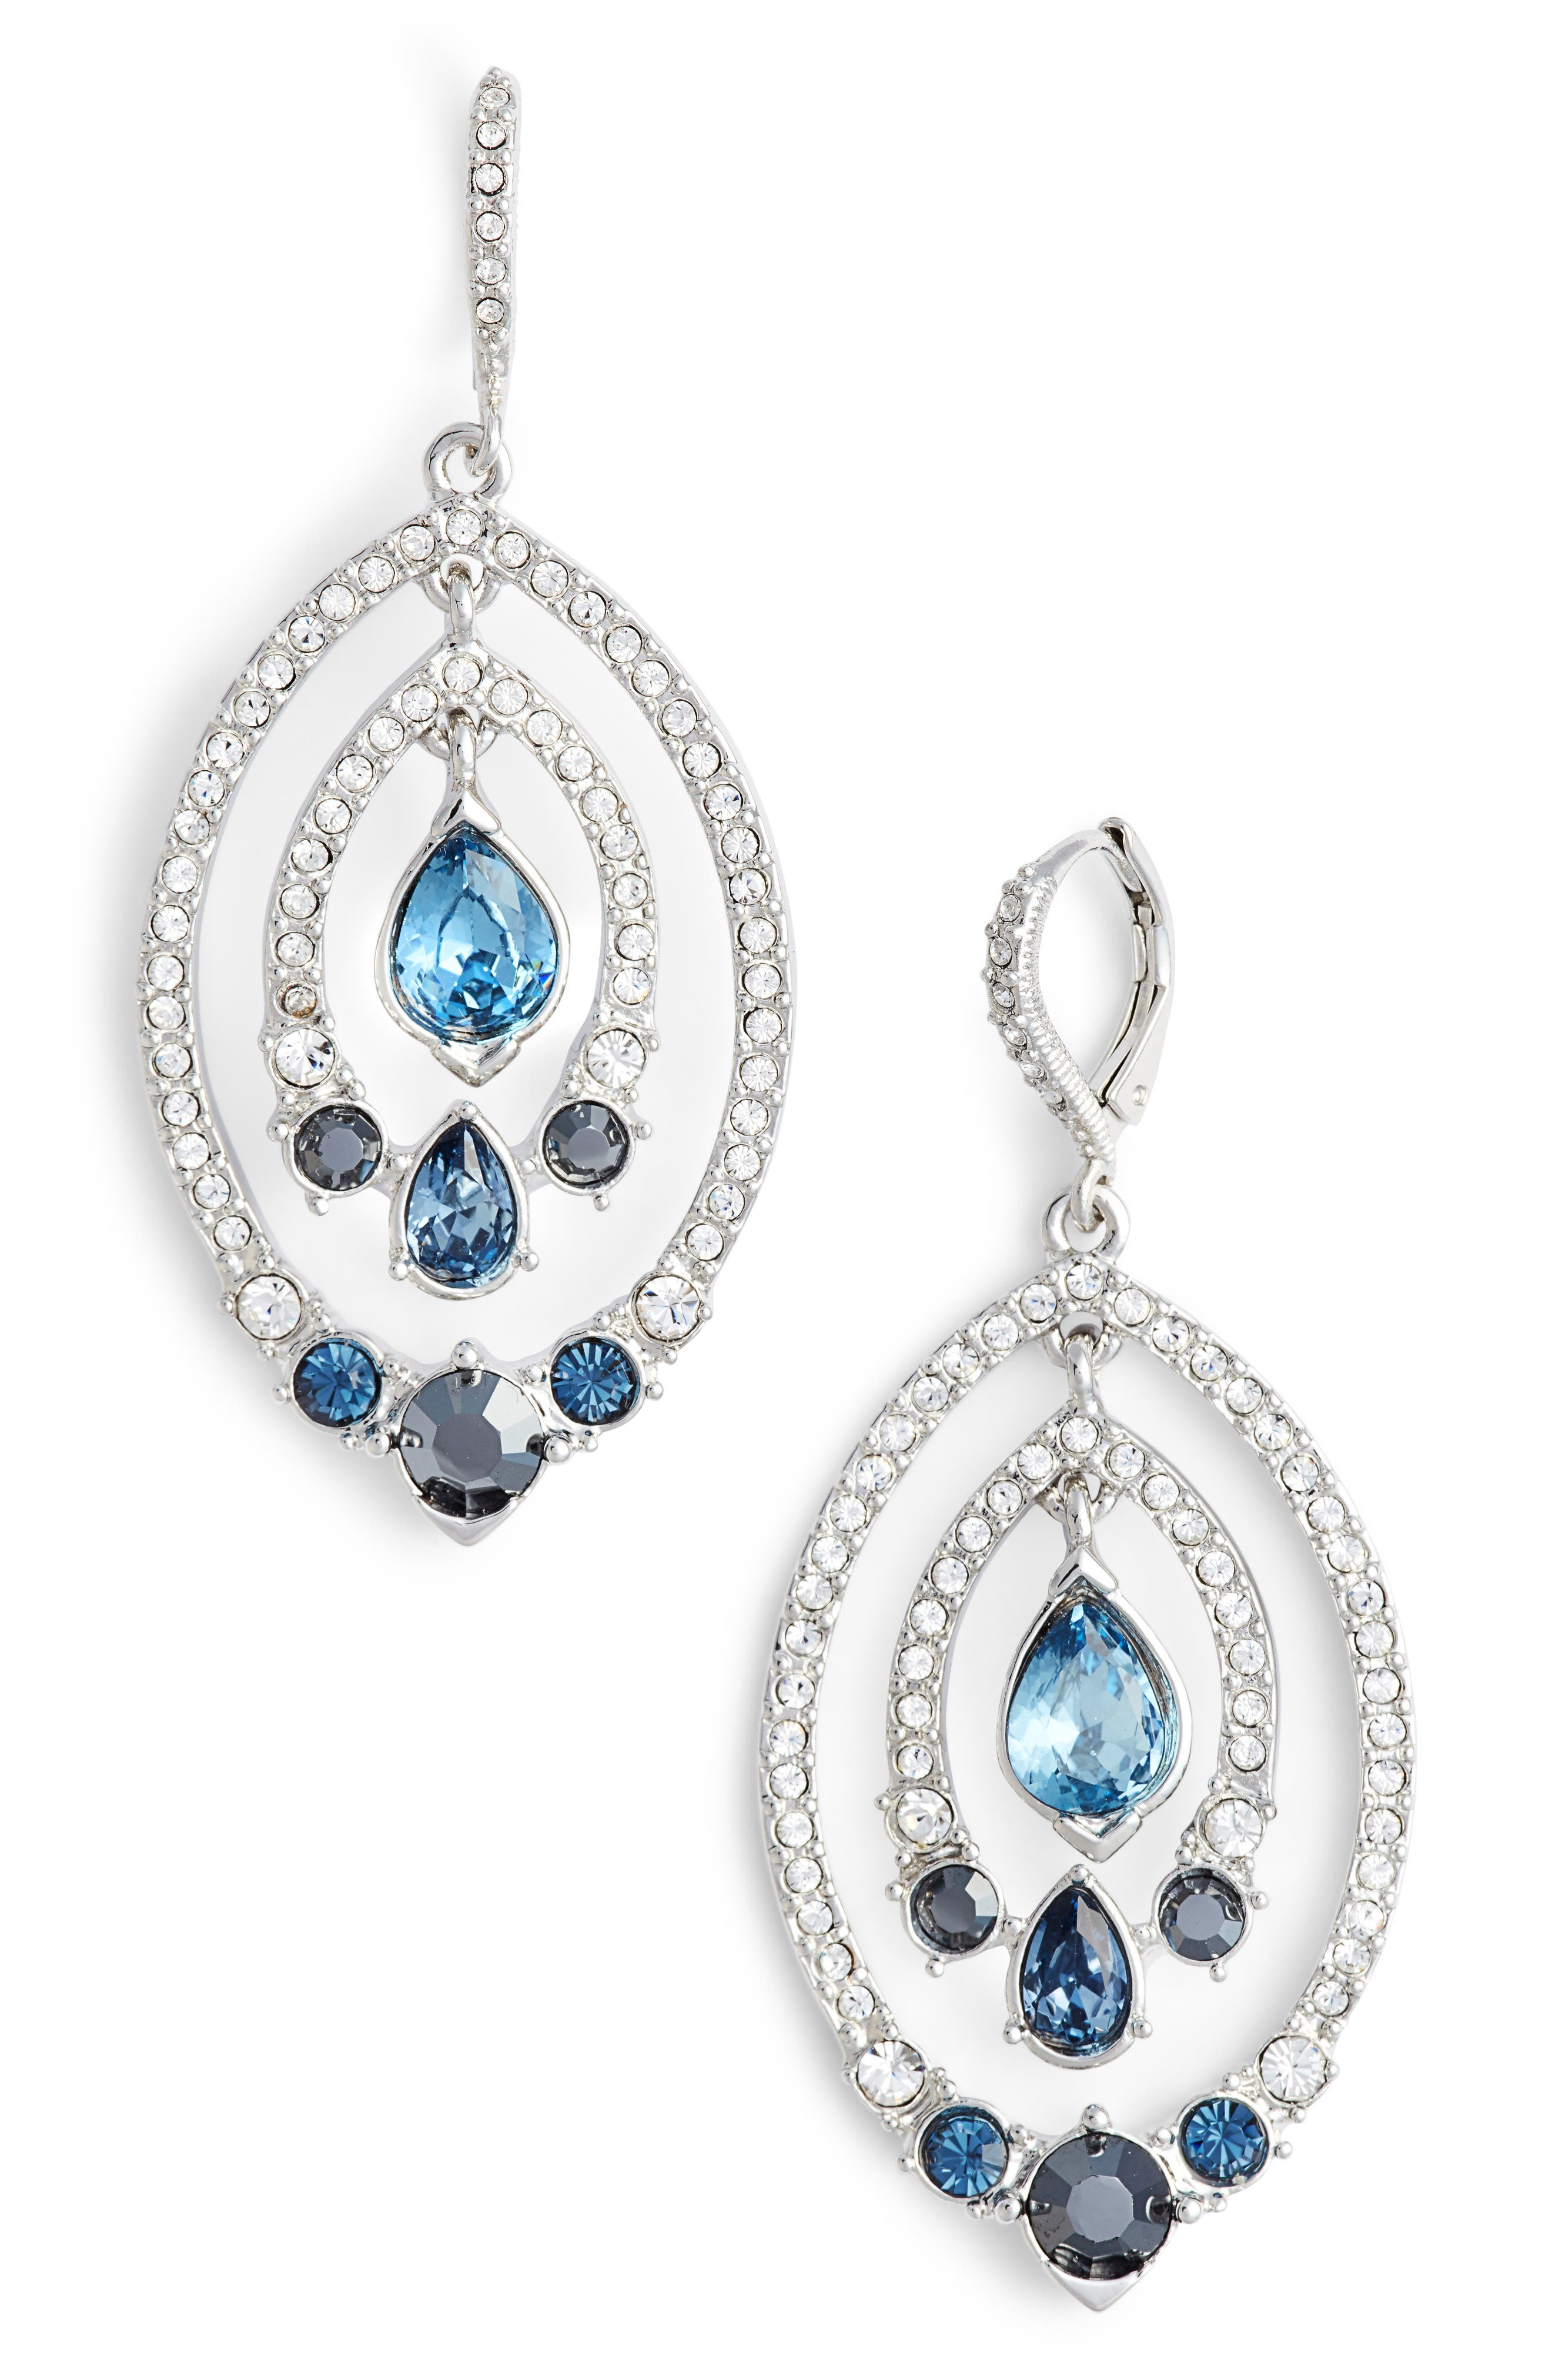 Jenny Packham Orbiting Drop earrings